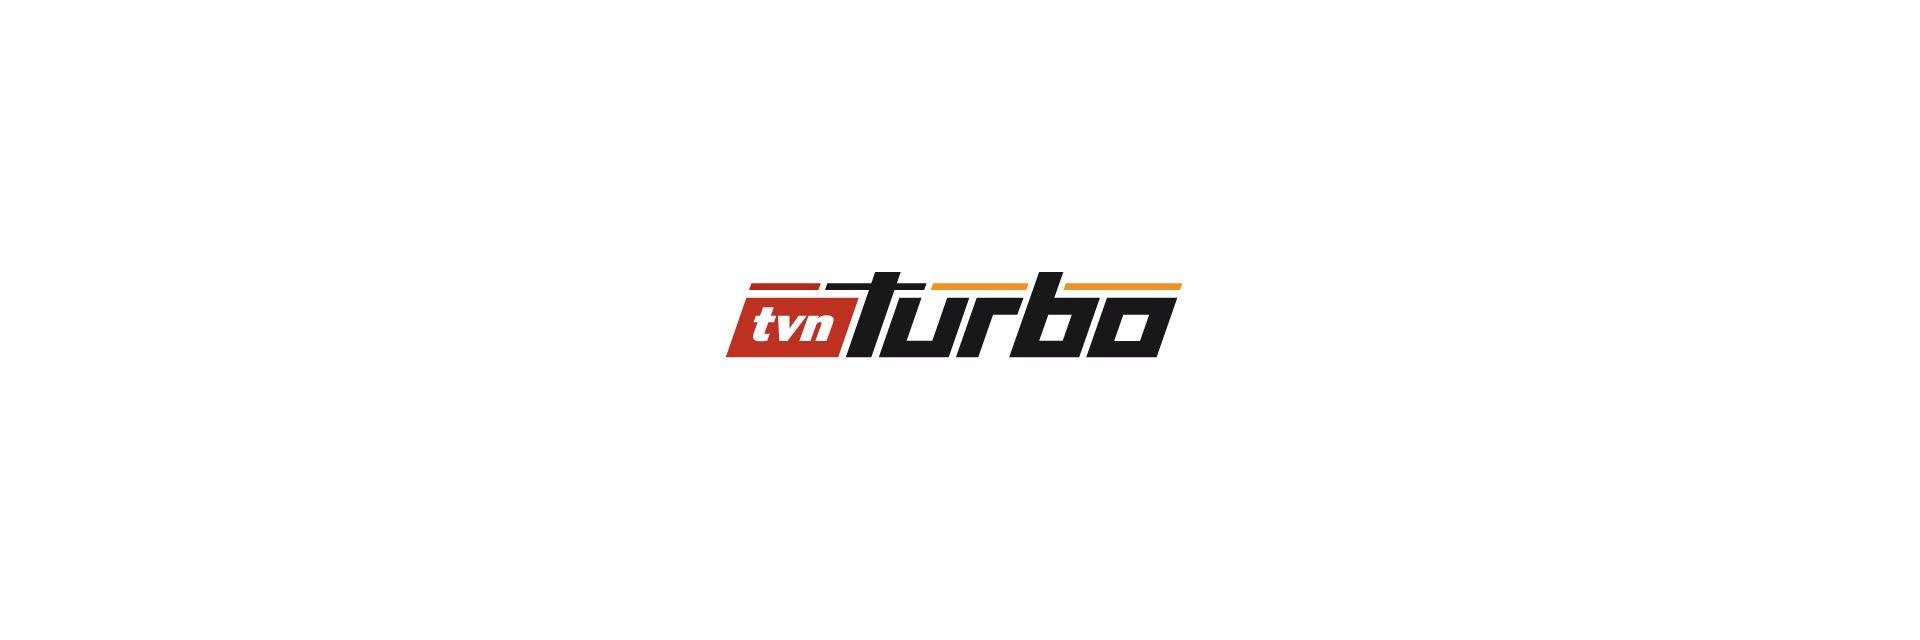 Ramówka TVN Turbo